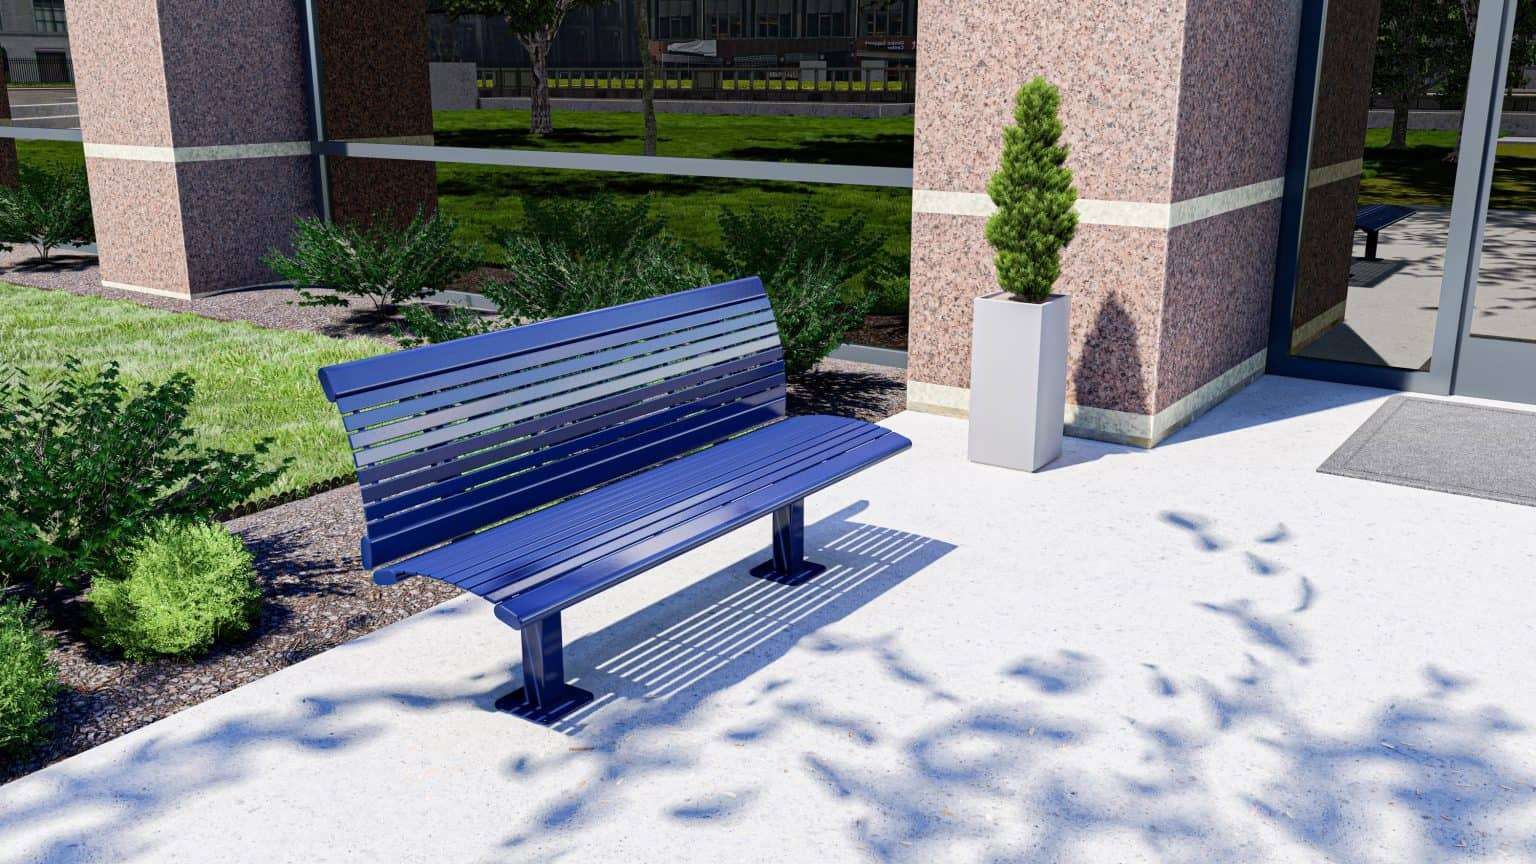 streetscape-furnishings_49643774731_o-1536x864